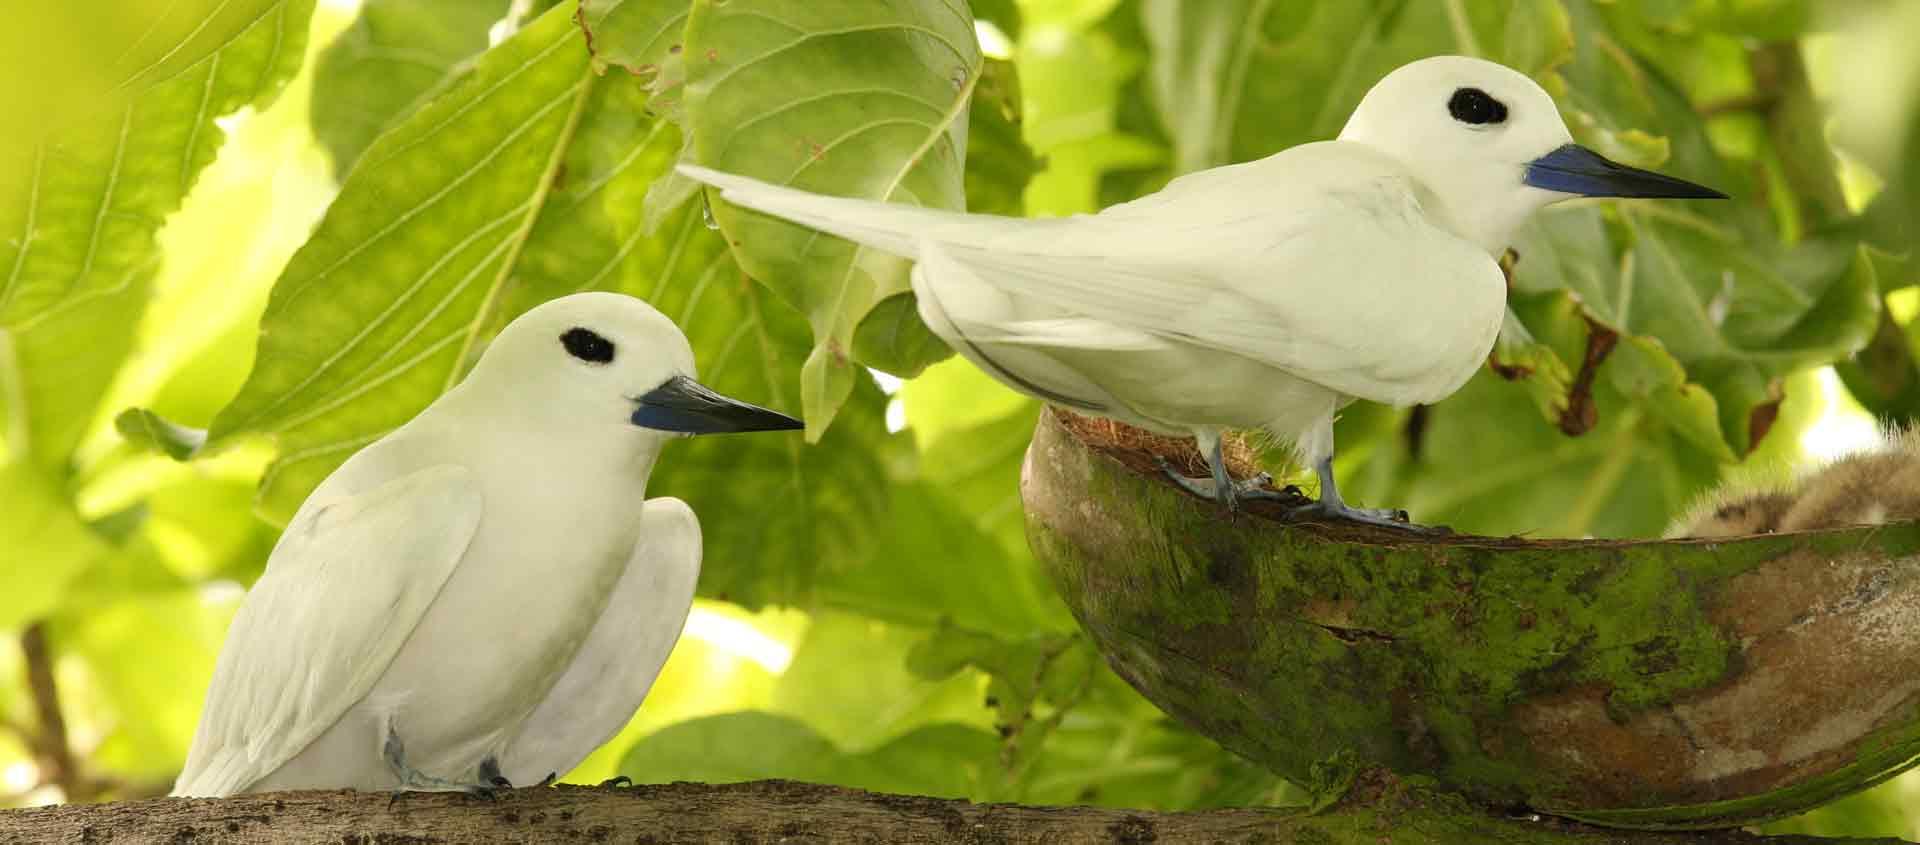 Seychelles Islands cruise image of Fairy Terns